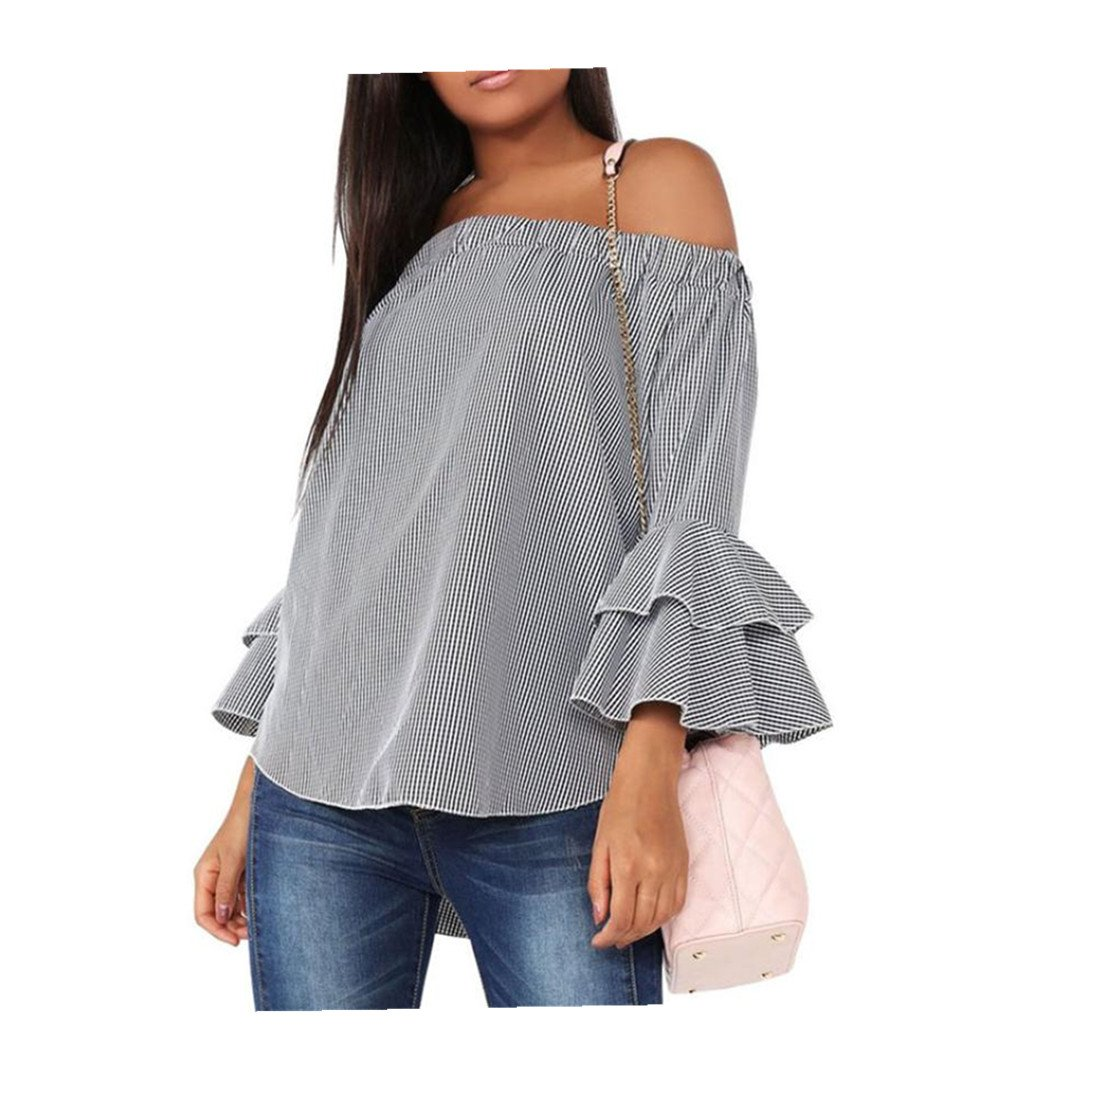 Fheaven Women Bell Long Sleeve Blouse Plaid Shirt Off Shoulder Tops (XL, Gray)